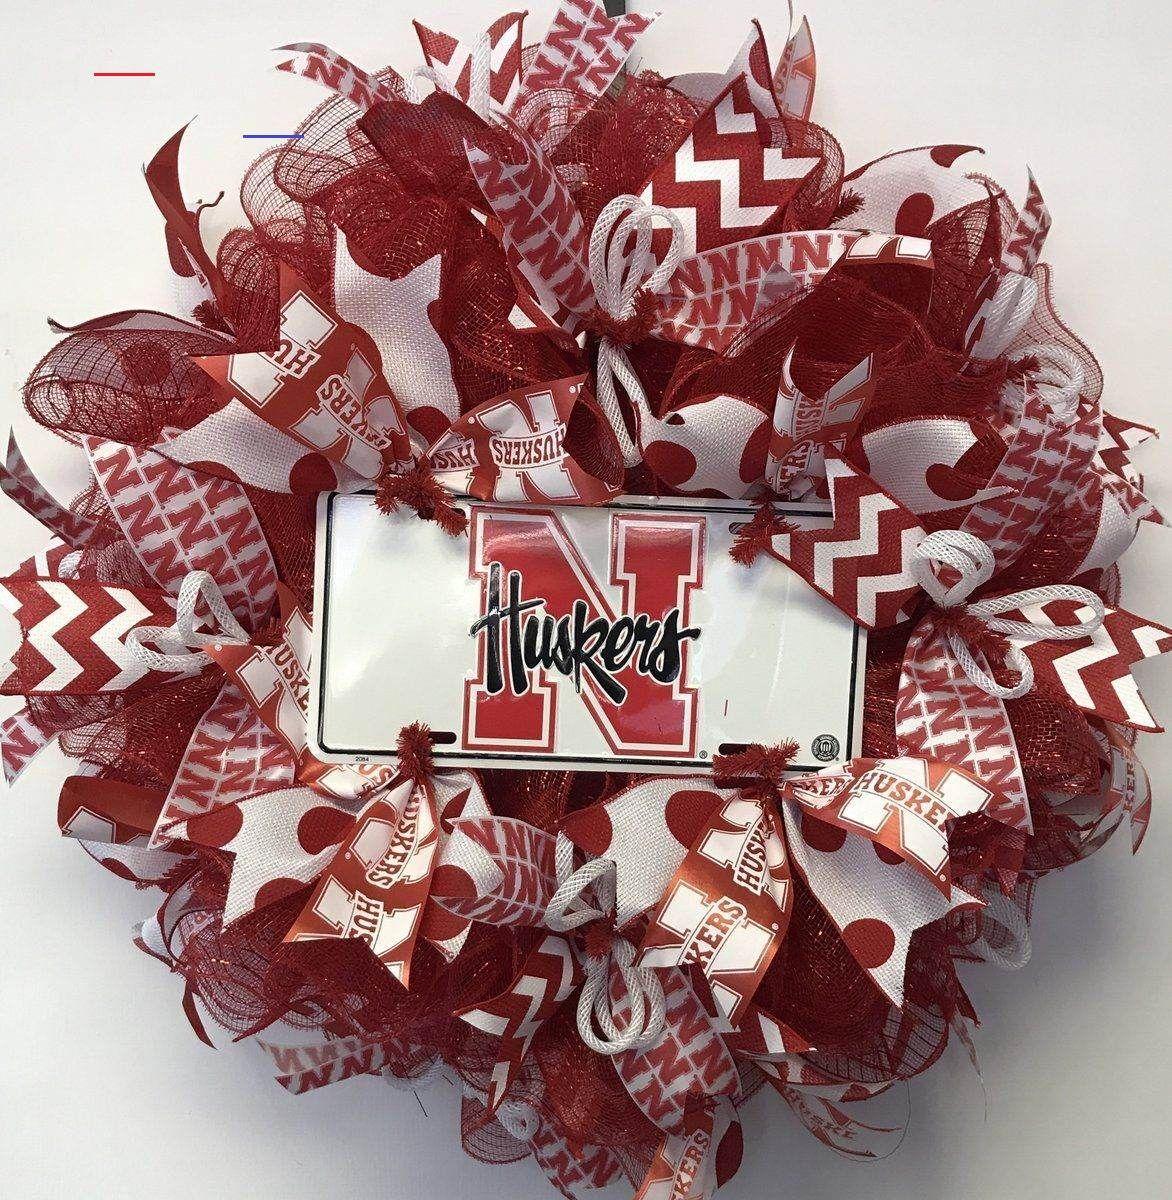 The Rock Scottsbluff Christmas 2020 valentinesnails in 2020 | Nebraska cornhuskers, Hochzeit spiele